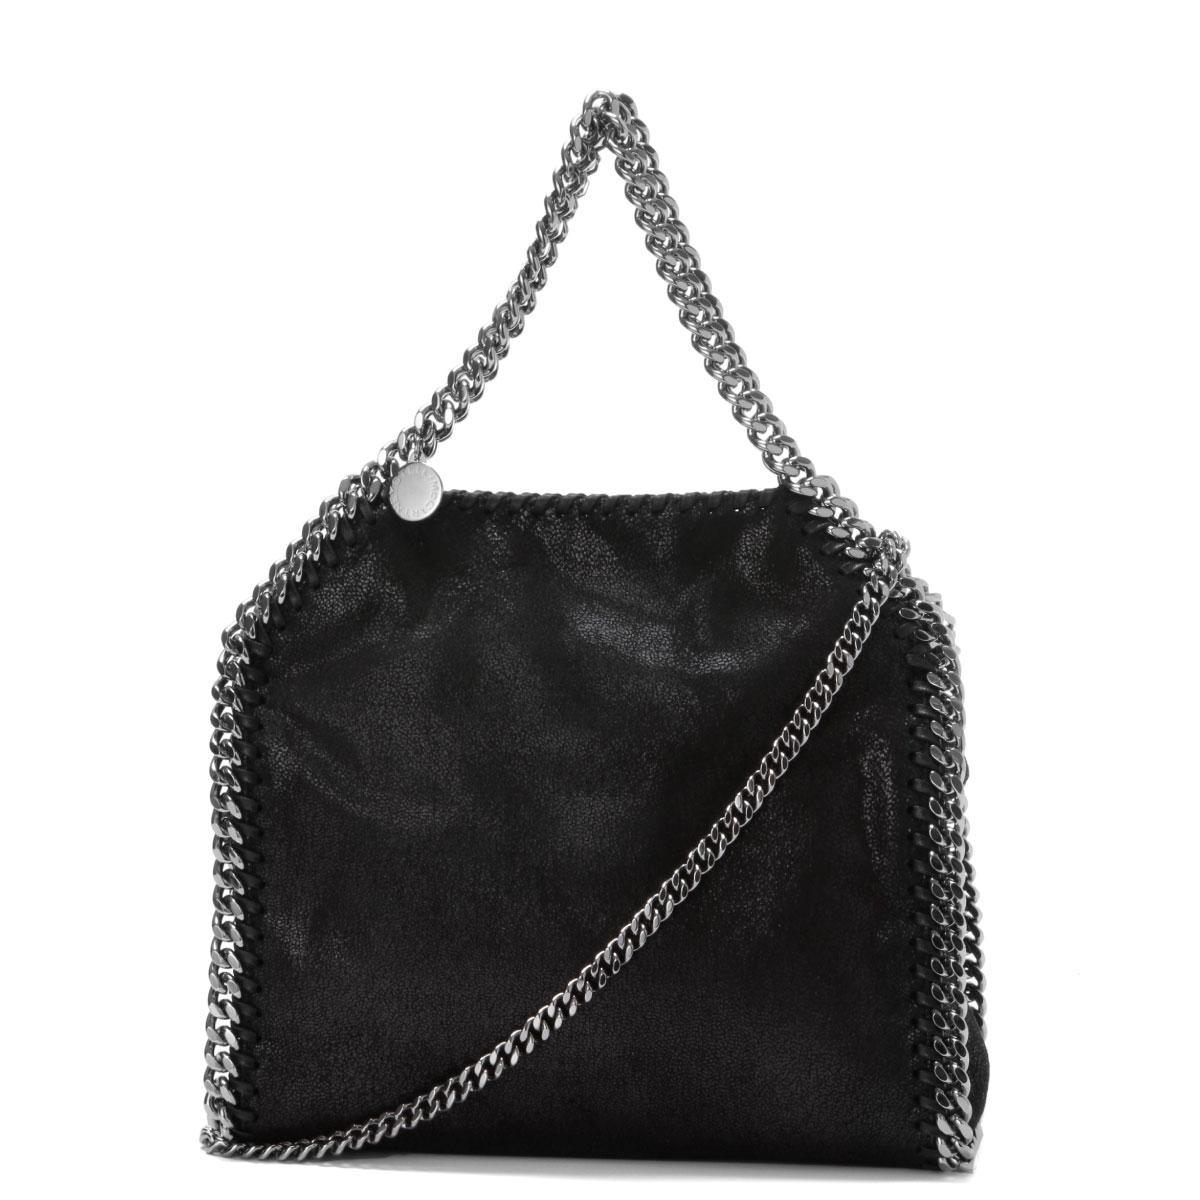 classic fit classic factory outlet STELLAMCCARTNEY (Stella McCartney) bag tote bag mini BLACK black FALABELLA  FALABELLA BLACK